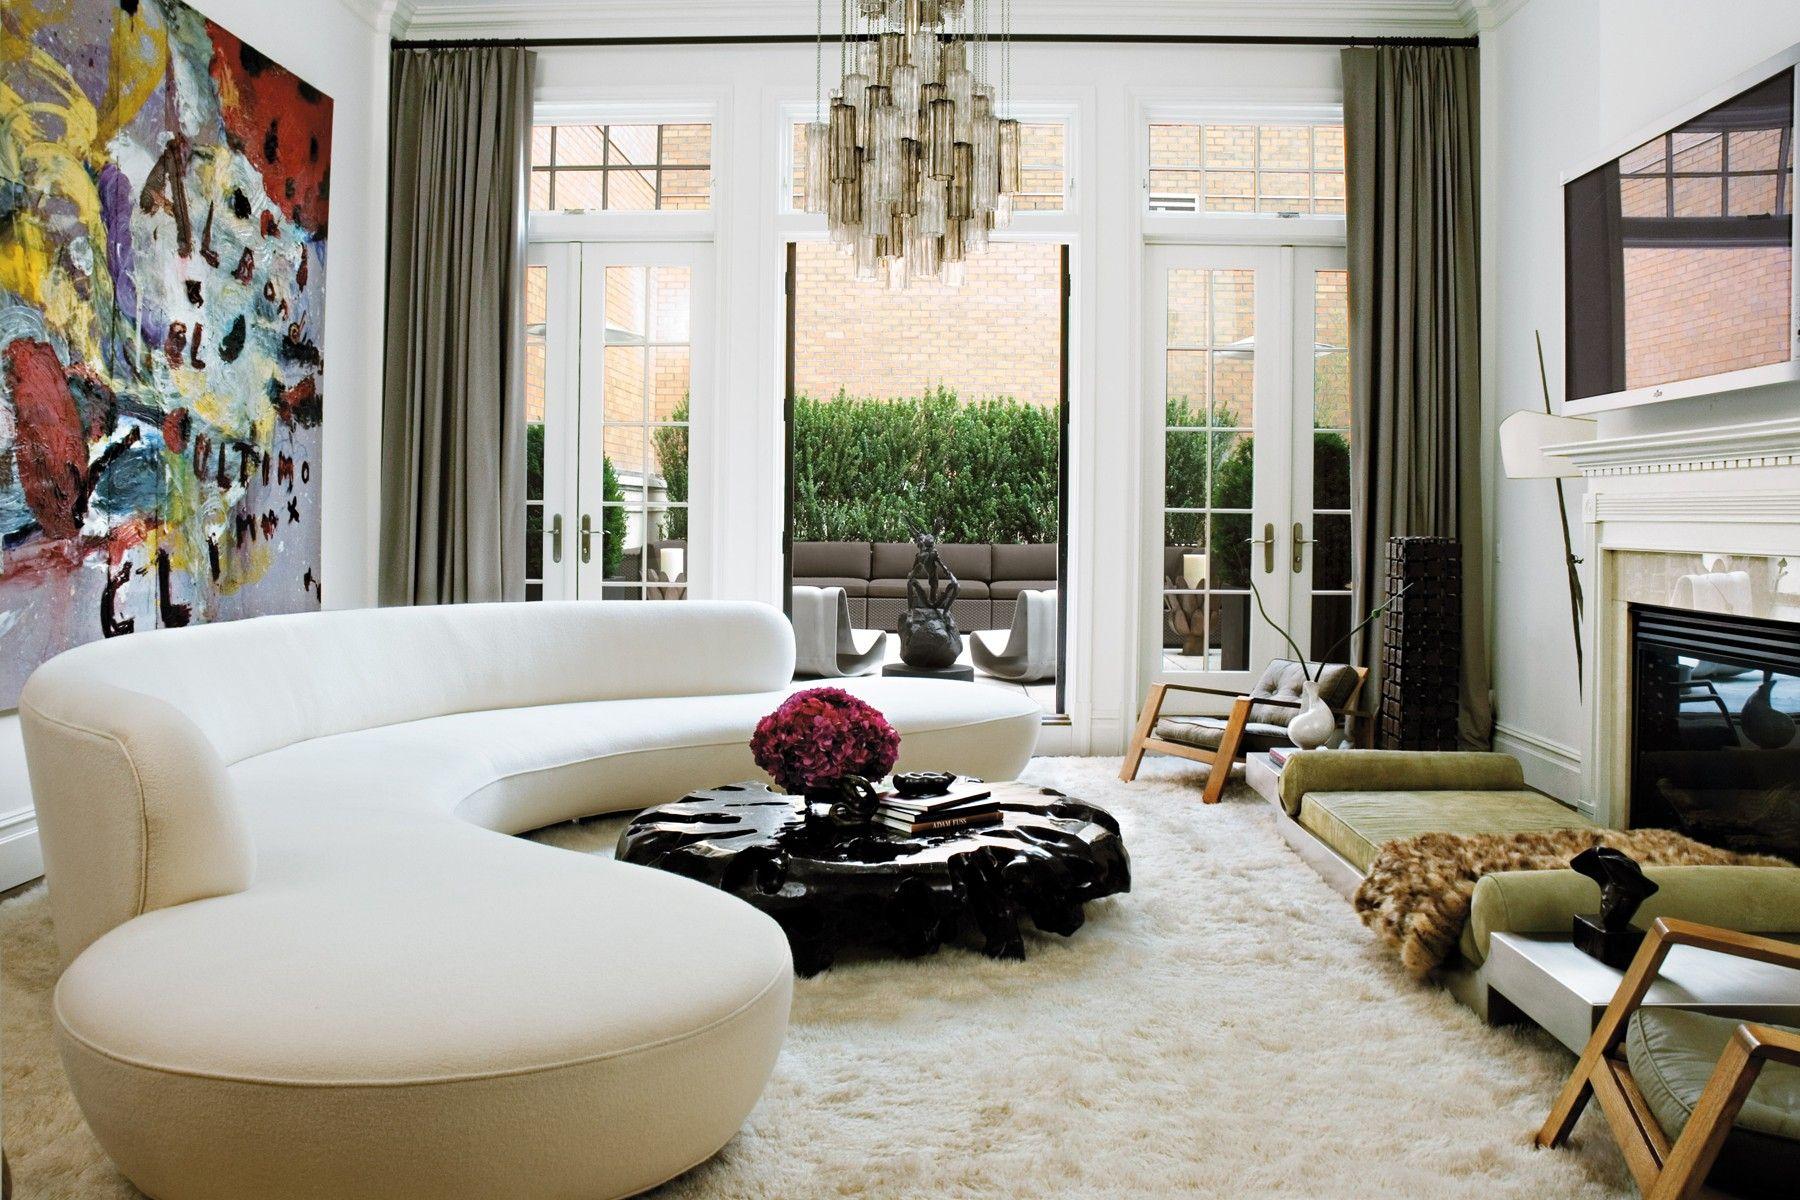 Furniture Design Hall Of Fame vladimir kagan | furniture | pinterest | living rooms, interiors